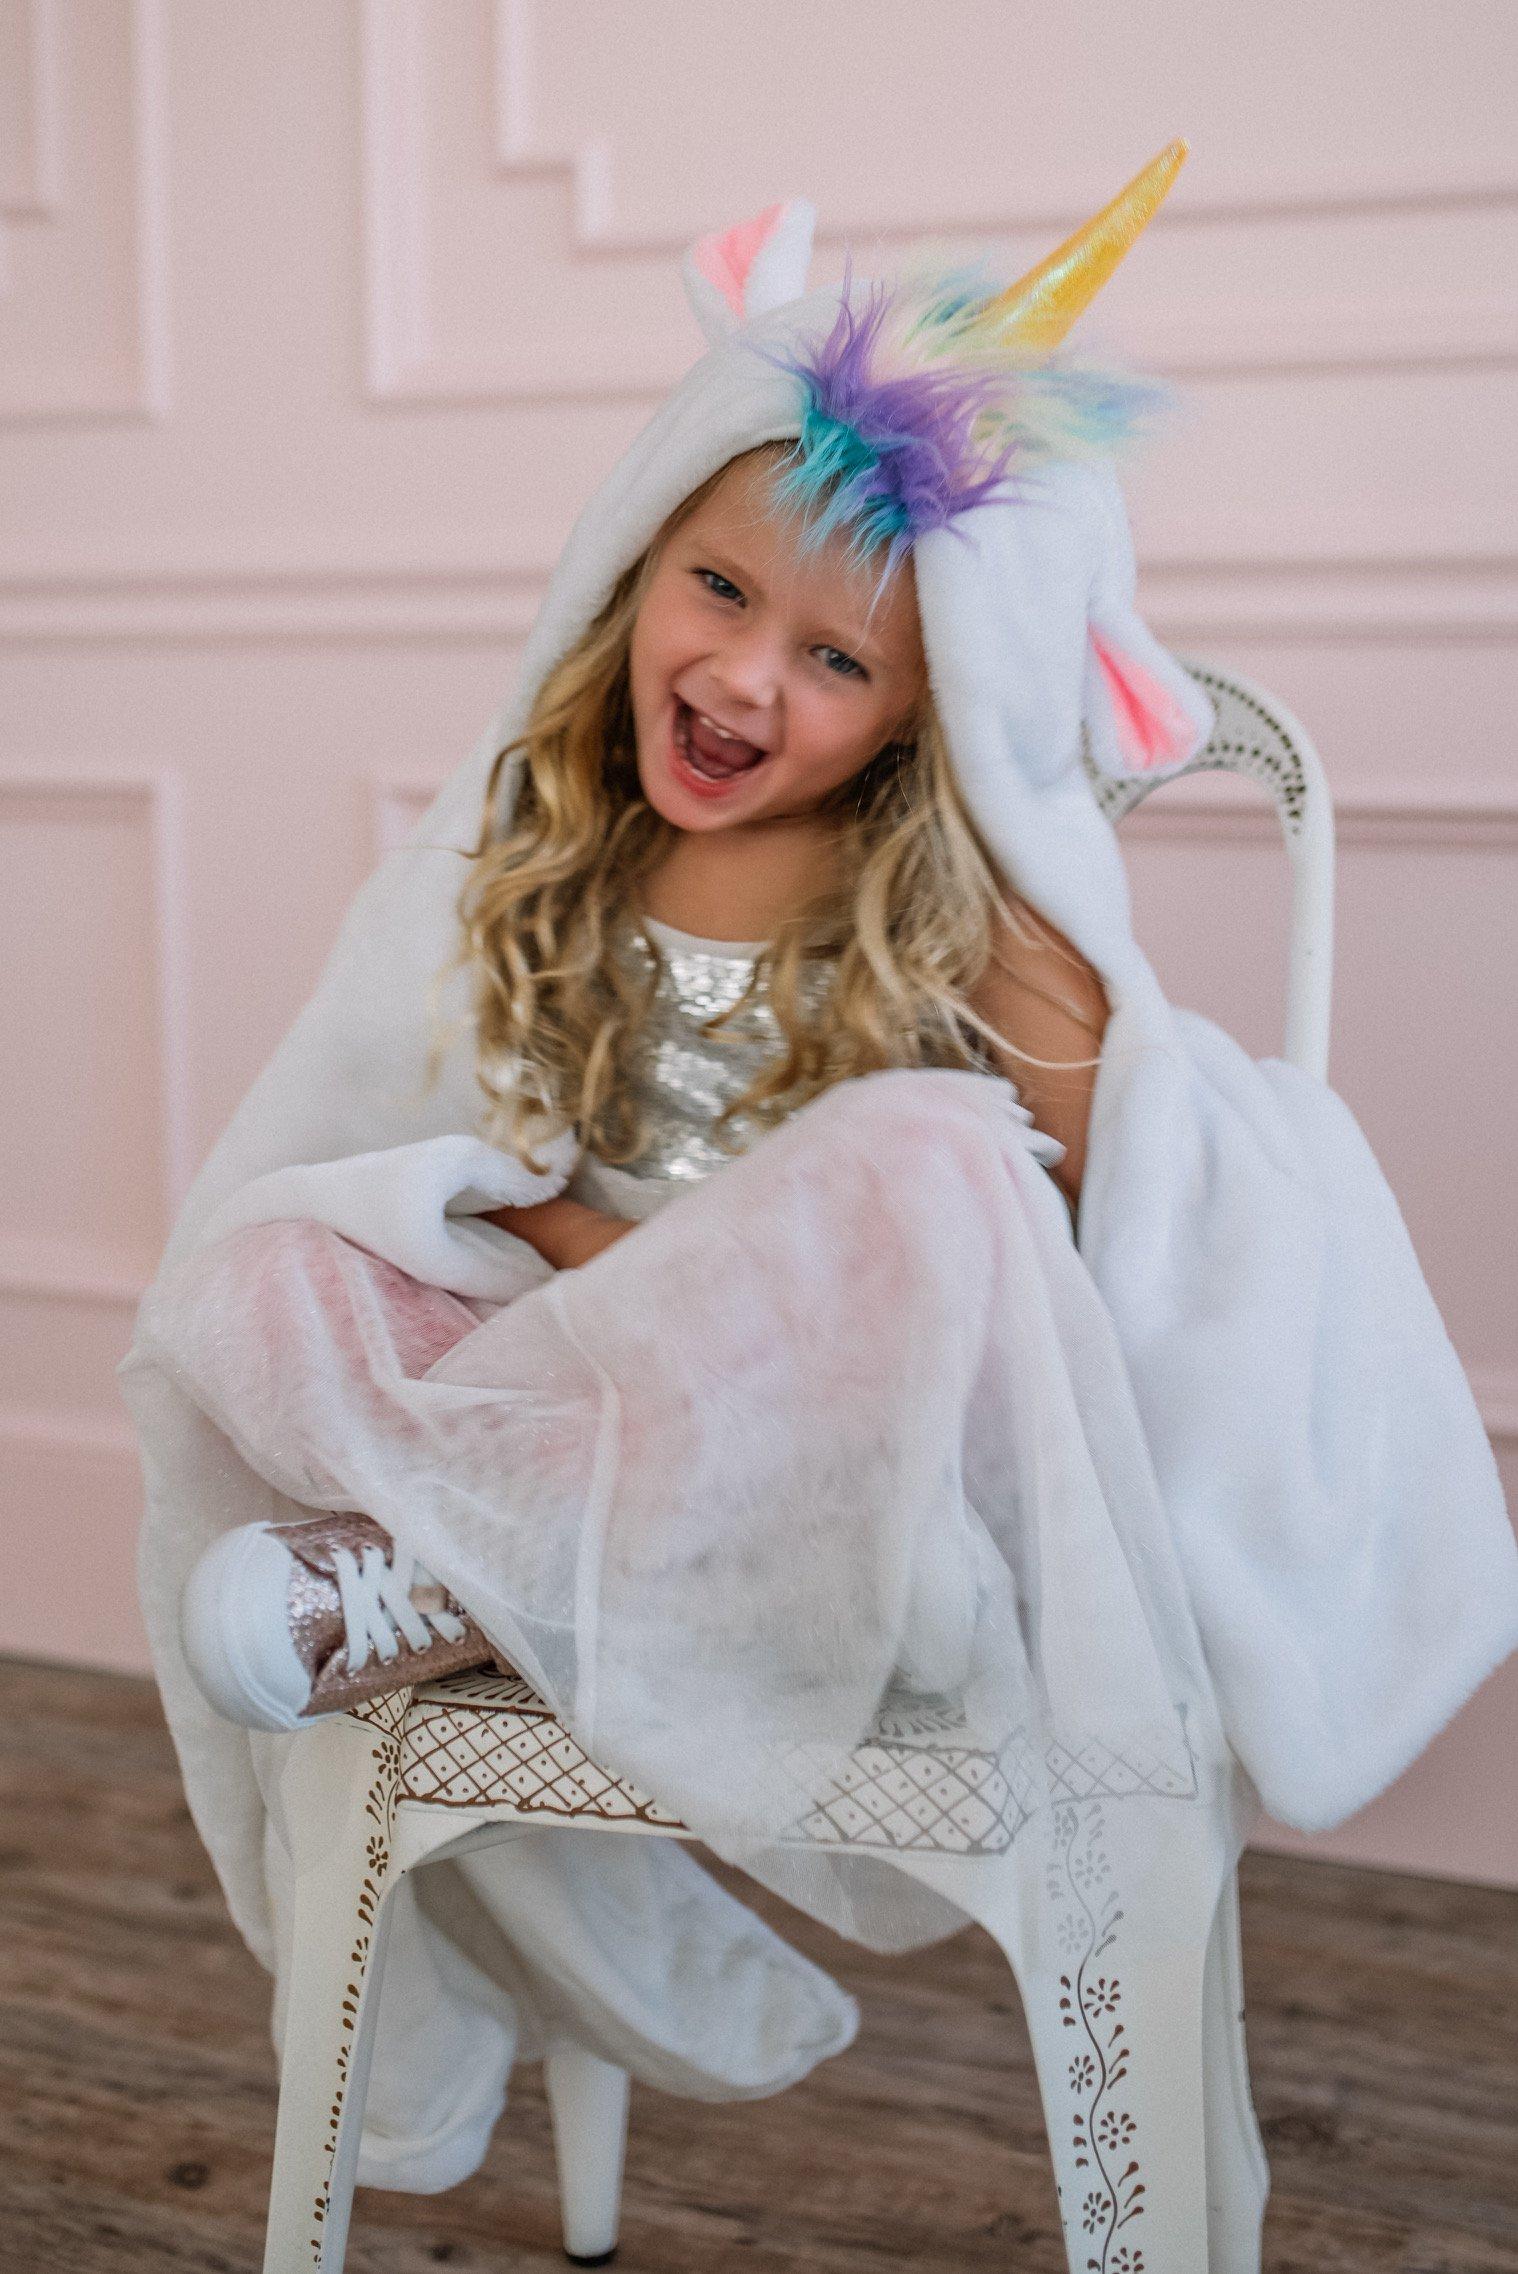 JaceyLane - Unicorn Blanket | Comfortable Soft Mink Fabric Blanket| by JaceyLane (Image #5)